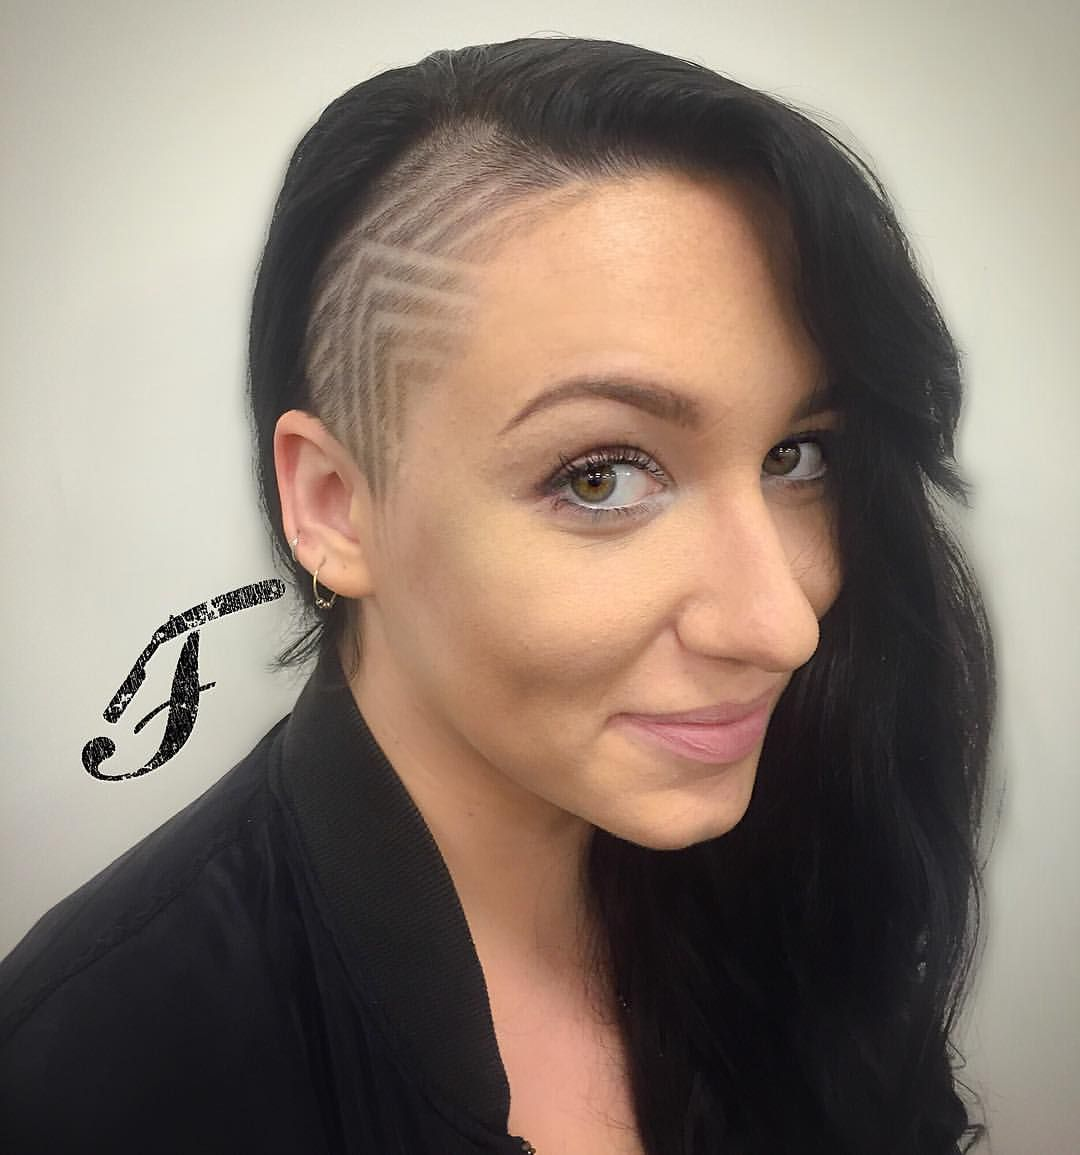 Sidecut Hair Tattoo Sidecuts Amp Undercuts Pinterest